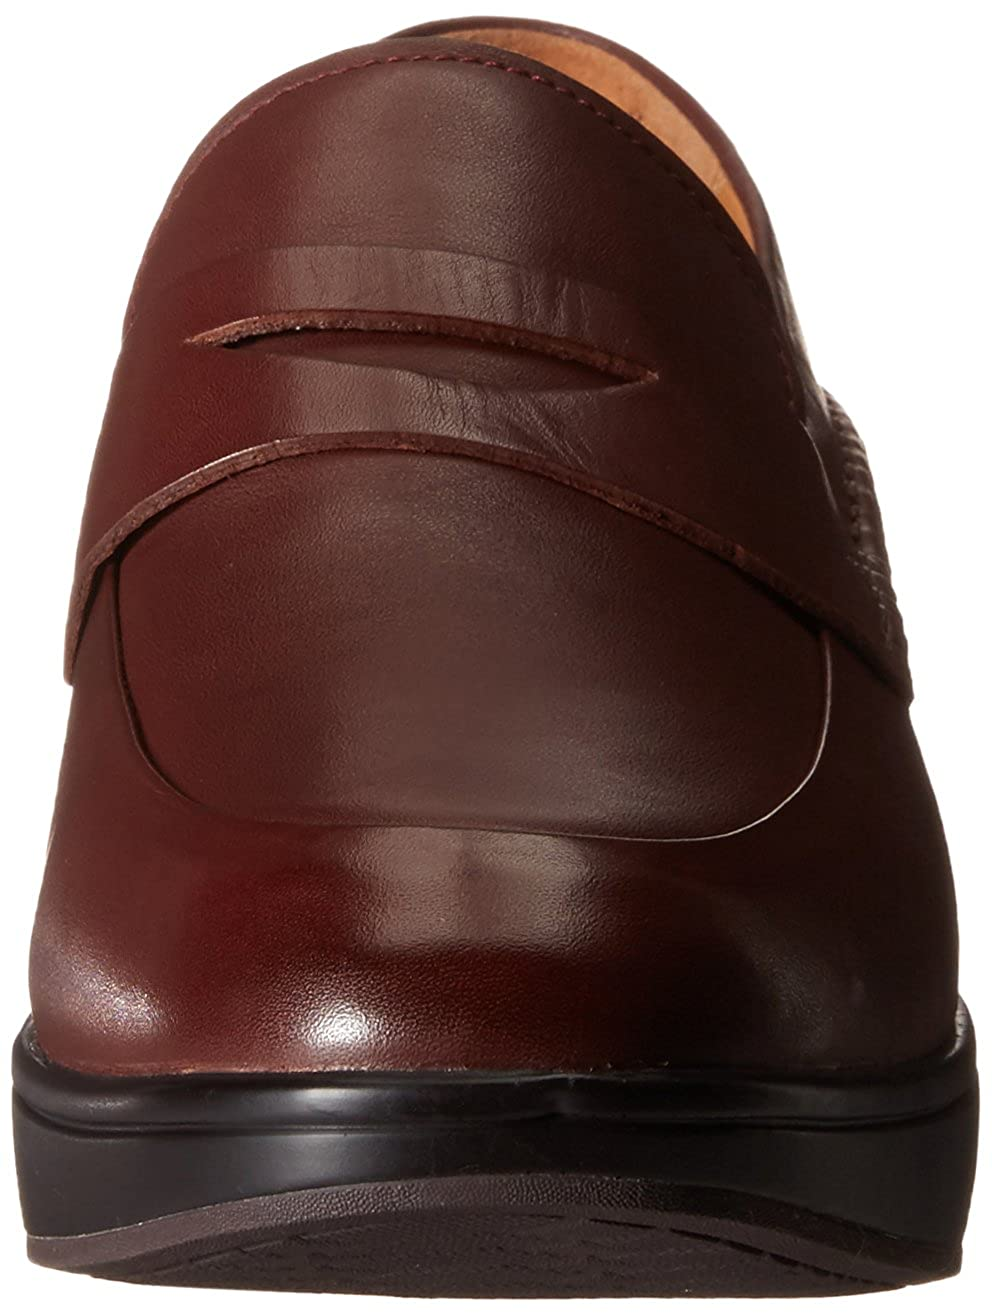 Amazon.com | MBT Men's Asante 5 Slip on-m, Mahogany, 40 EU/6-6.5 M US |  Shoes